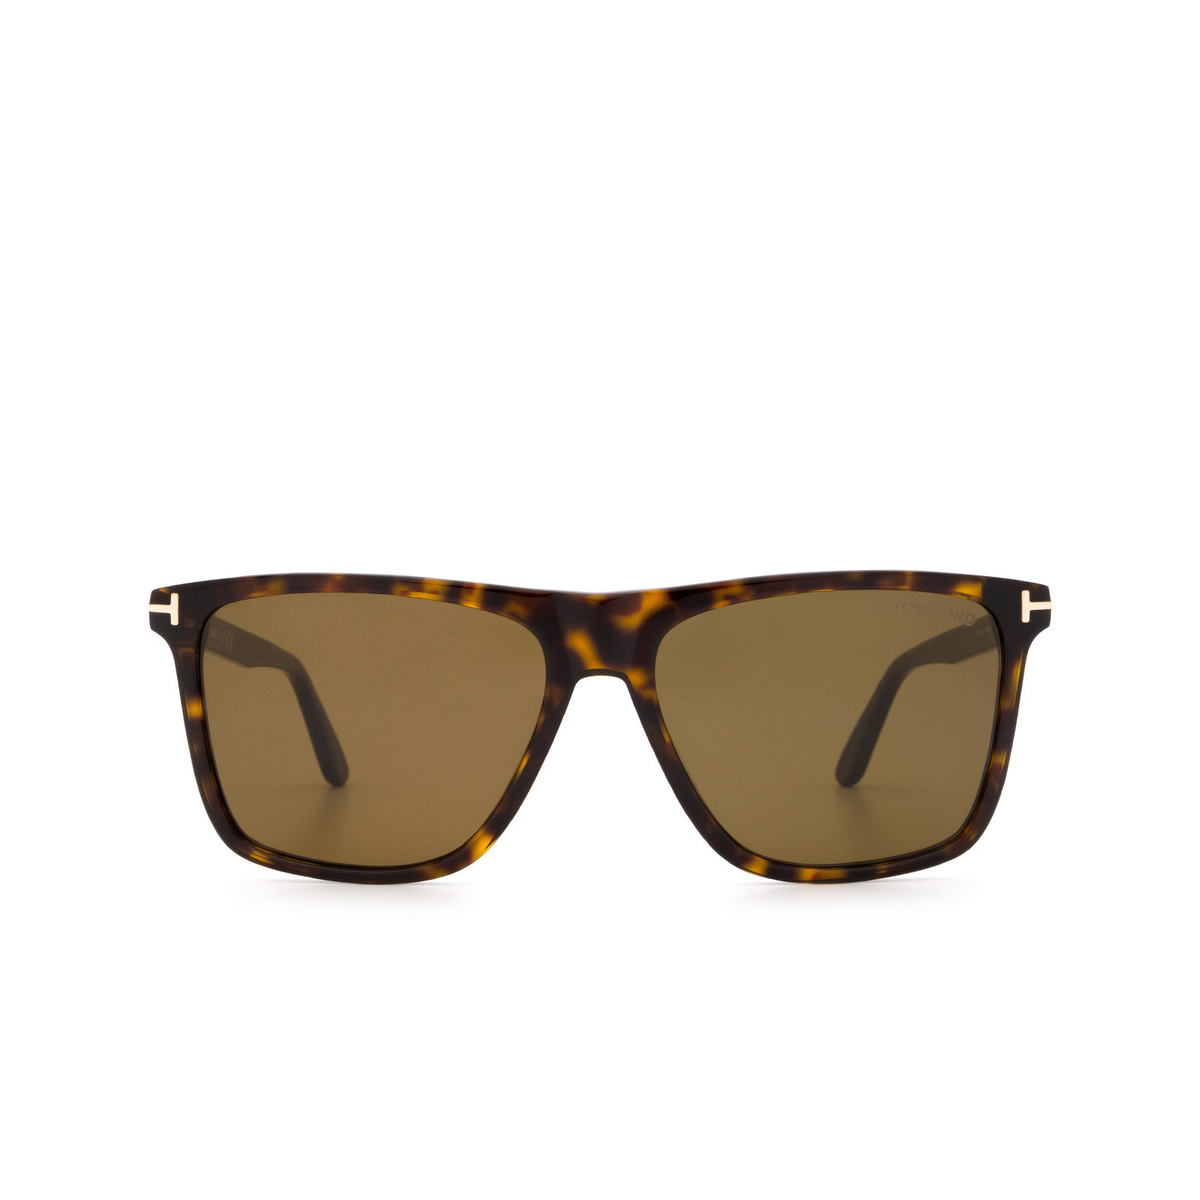 Tom Ford® Square Sunglasses: Fletcher FT0832 color Dark Havana 52J - front view.